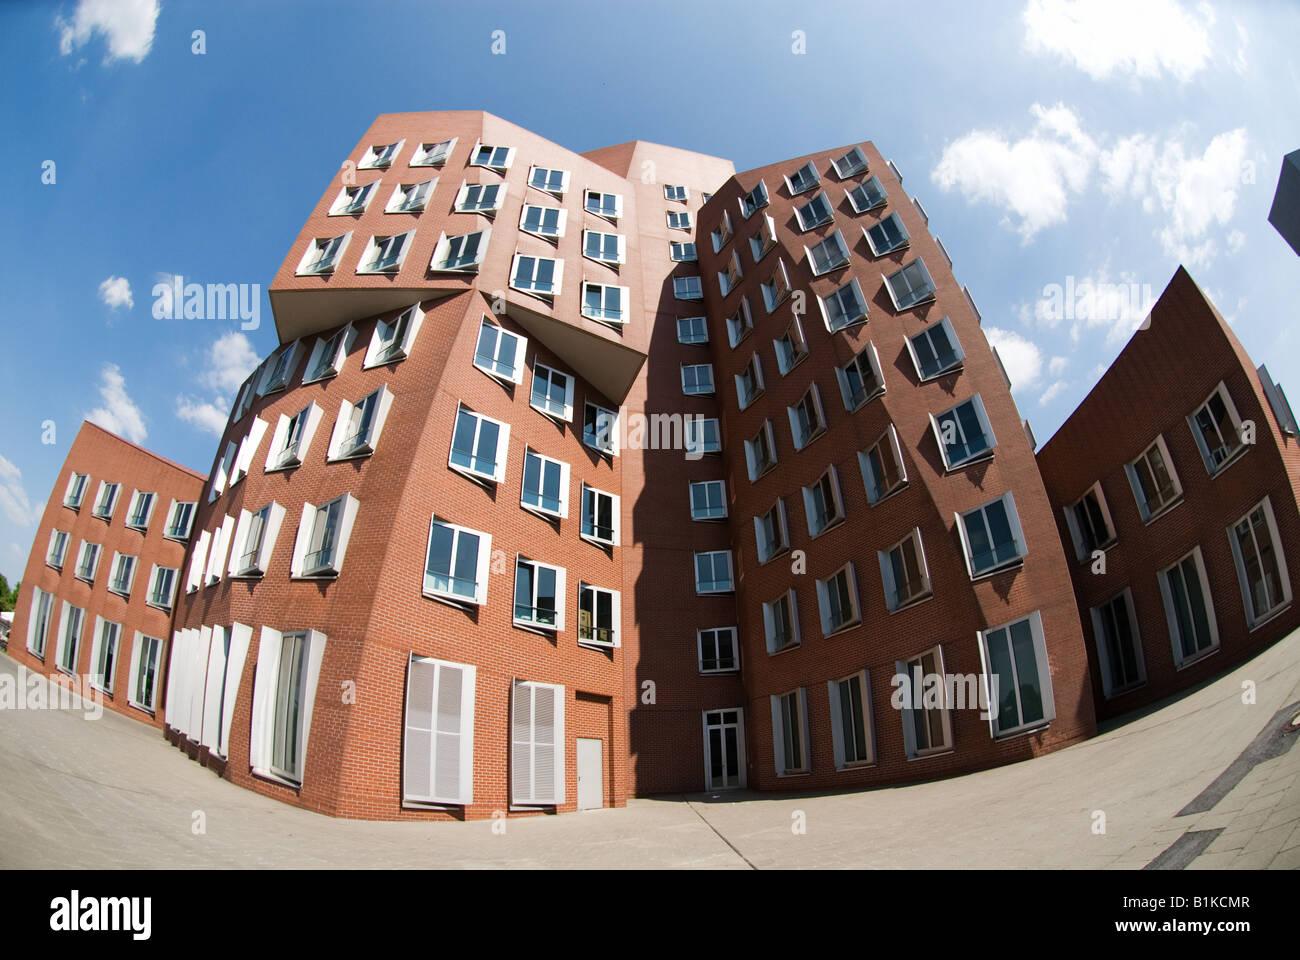 Frank Gehry Building, Medienhafen Duesseldorf, Germany - Stock Image